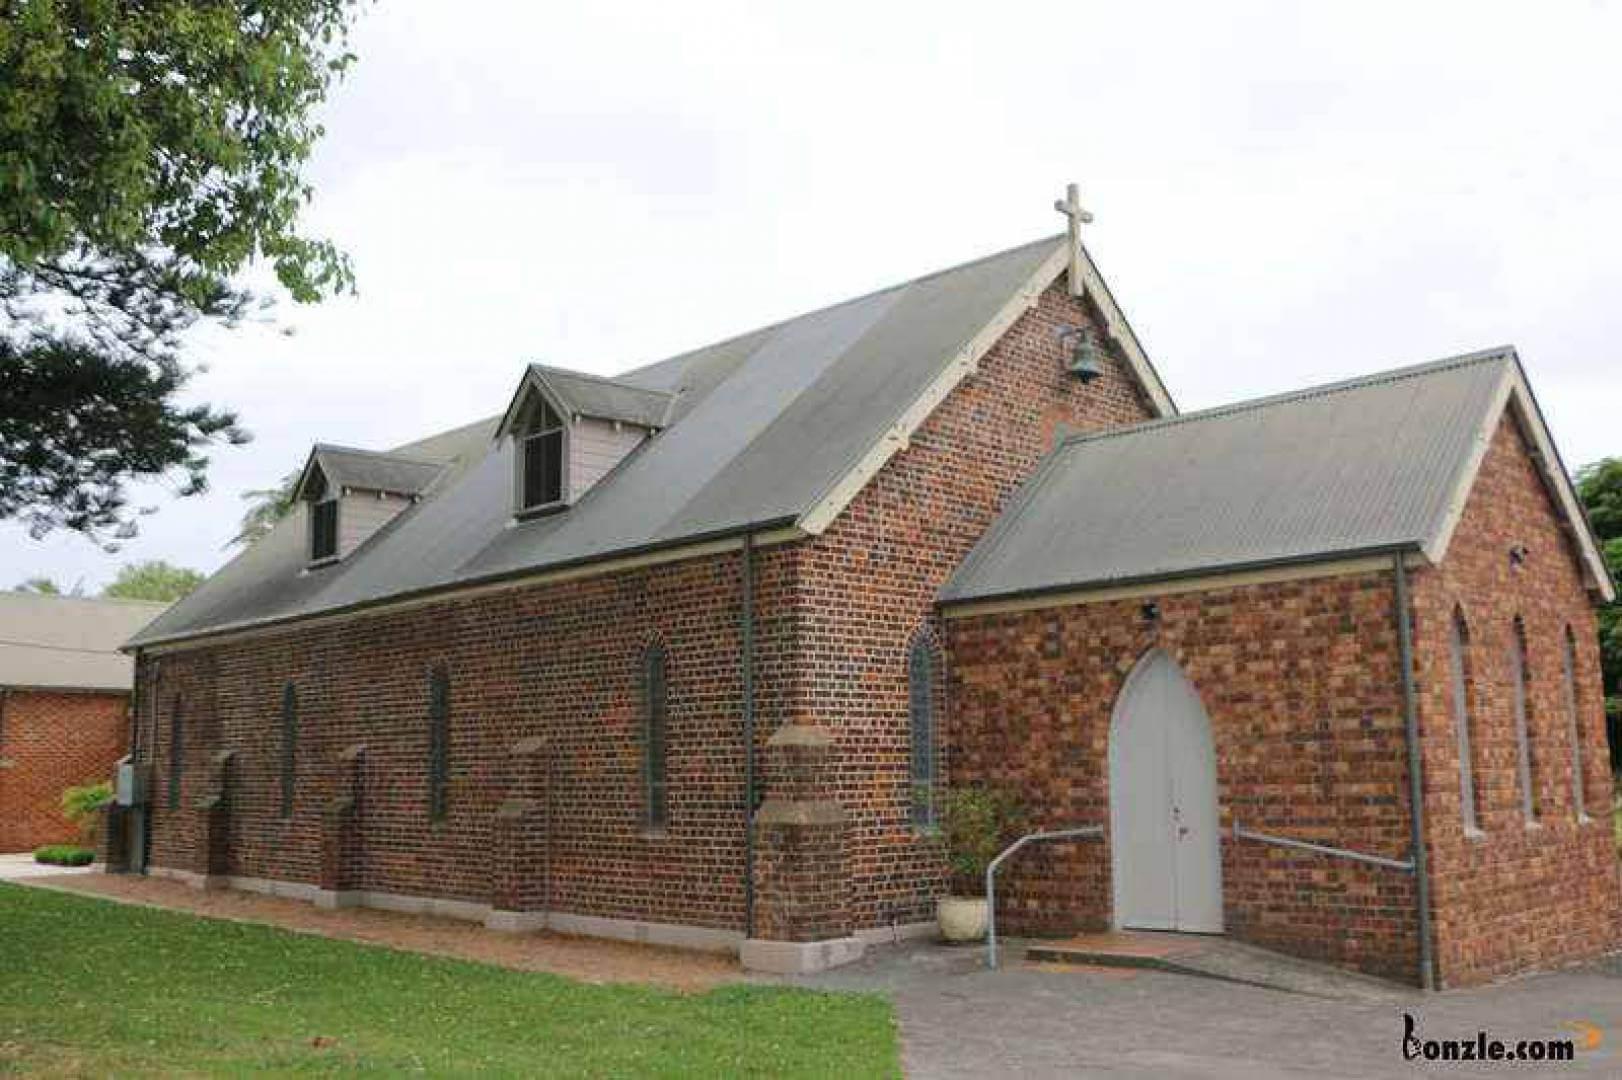 St Luke' Anglican Church